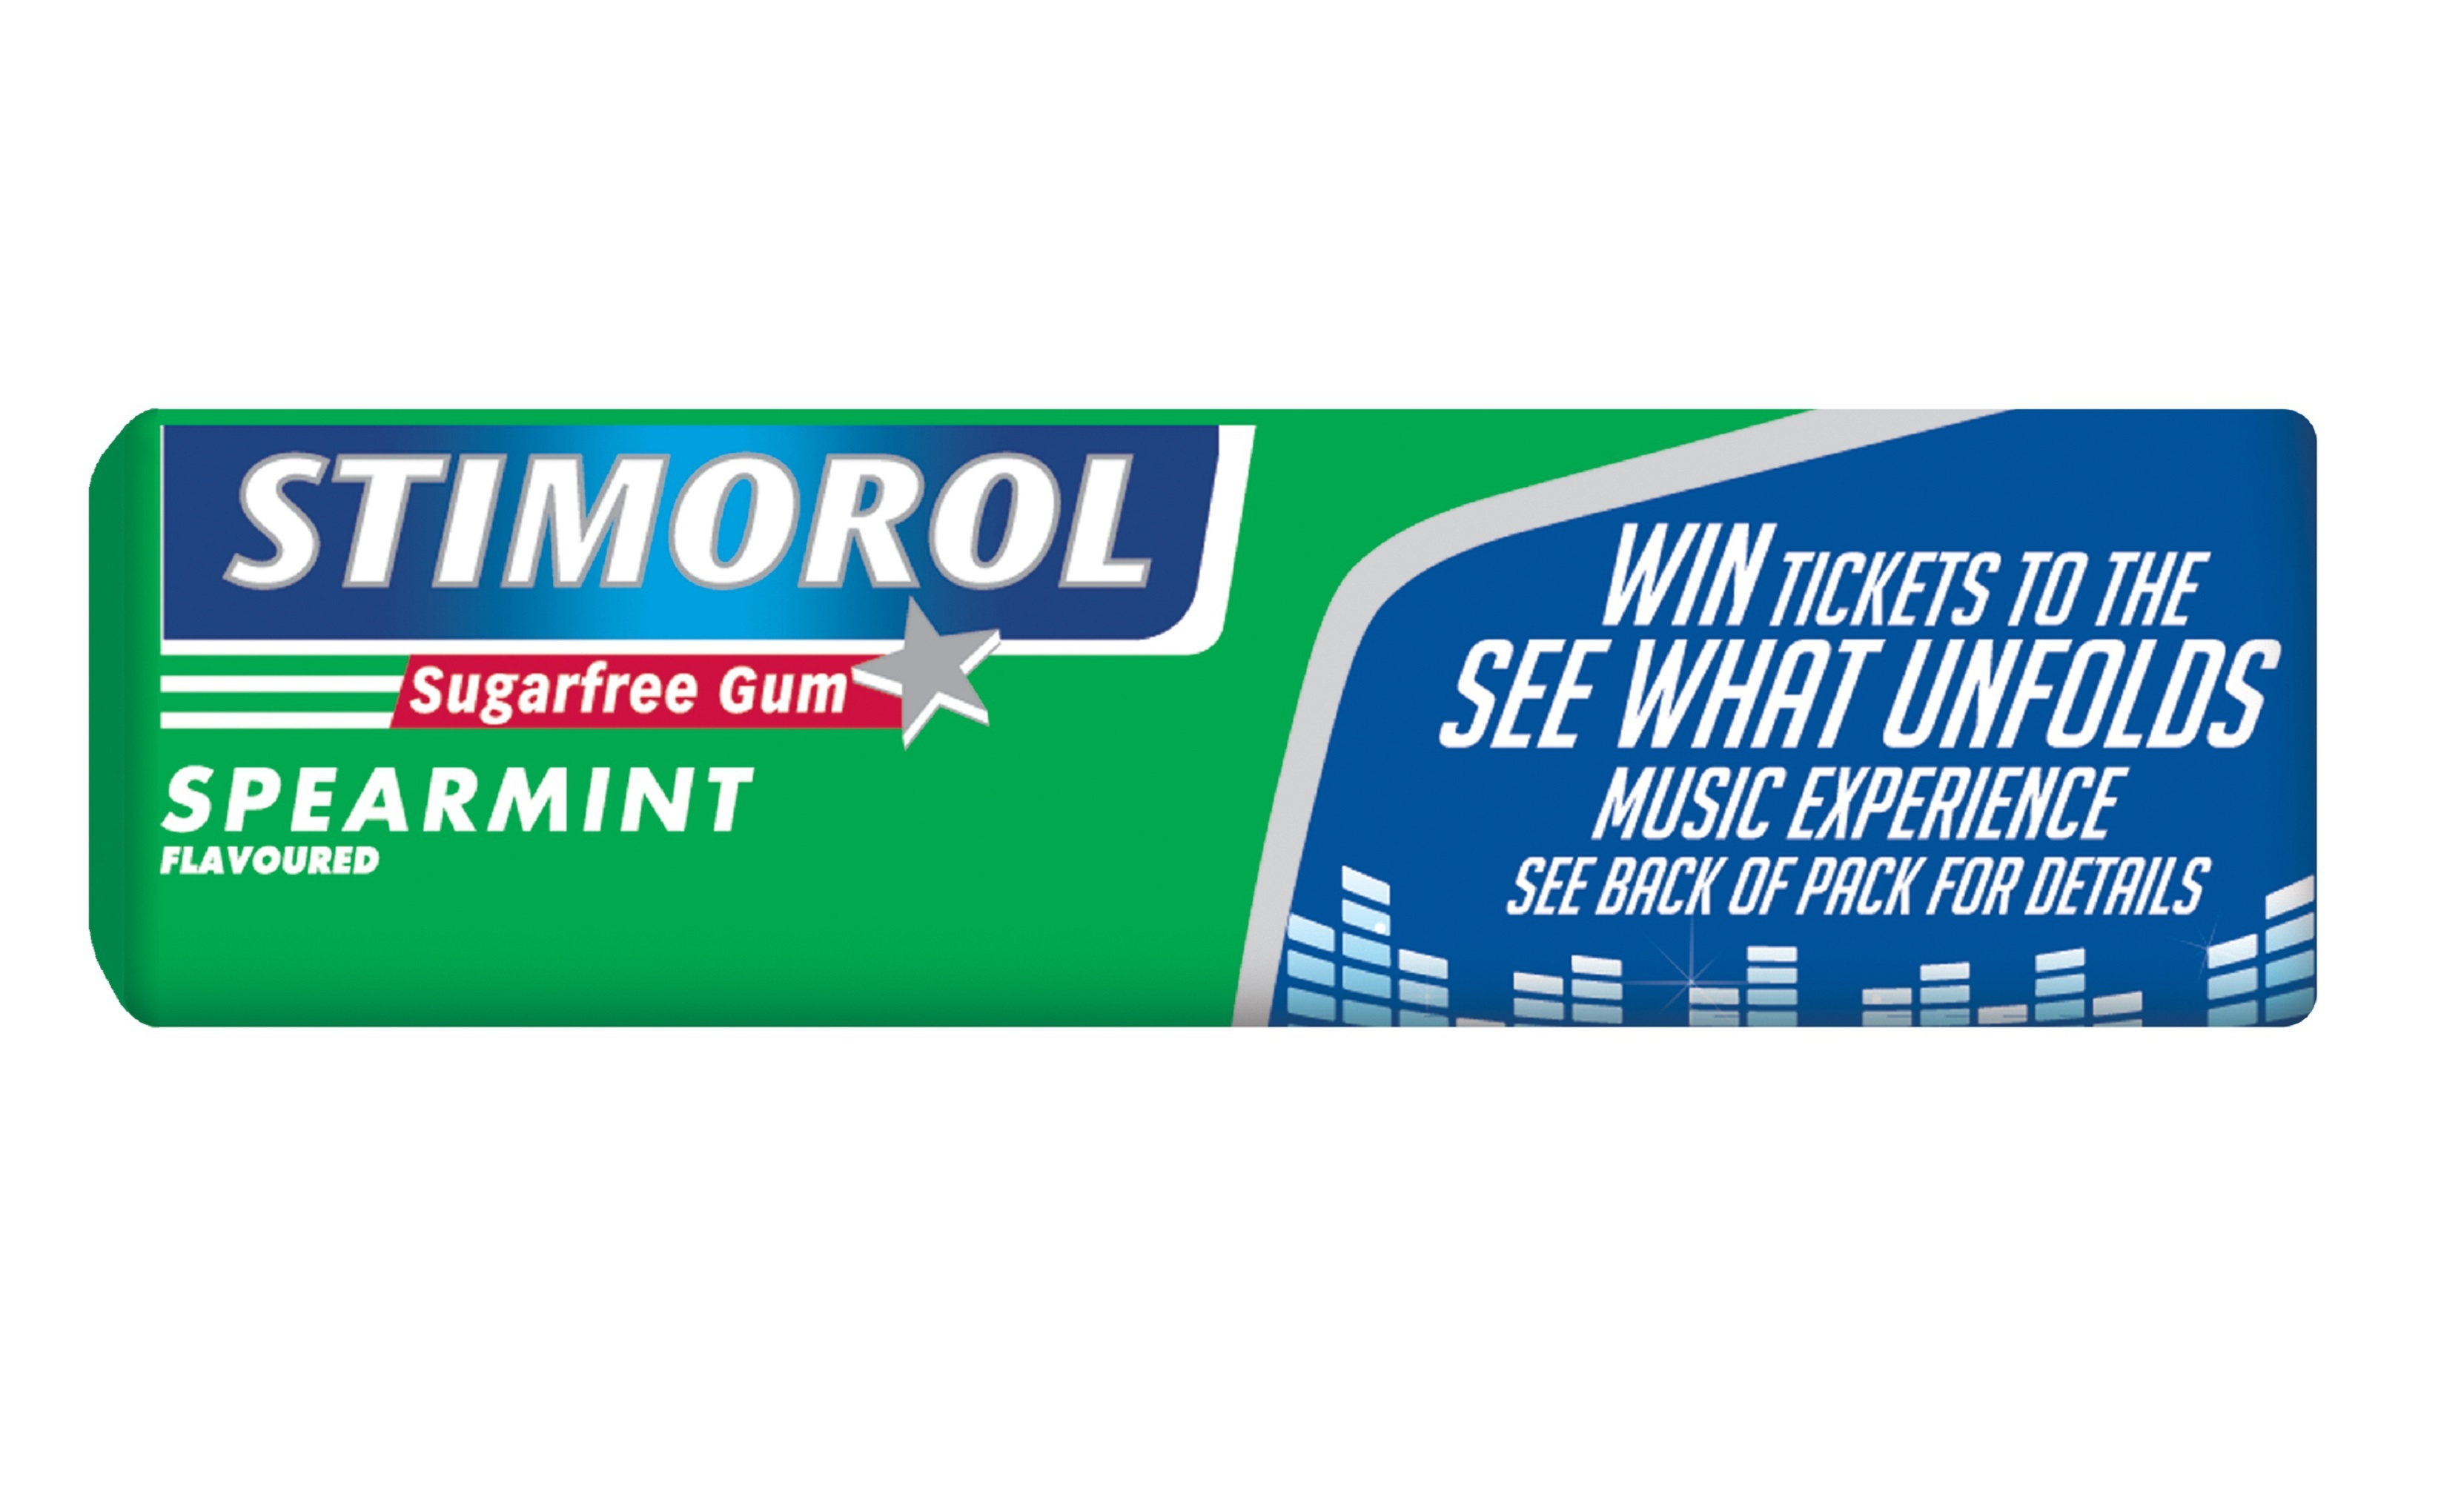 Stimorol 4k